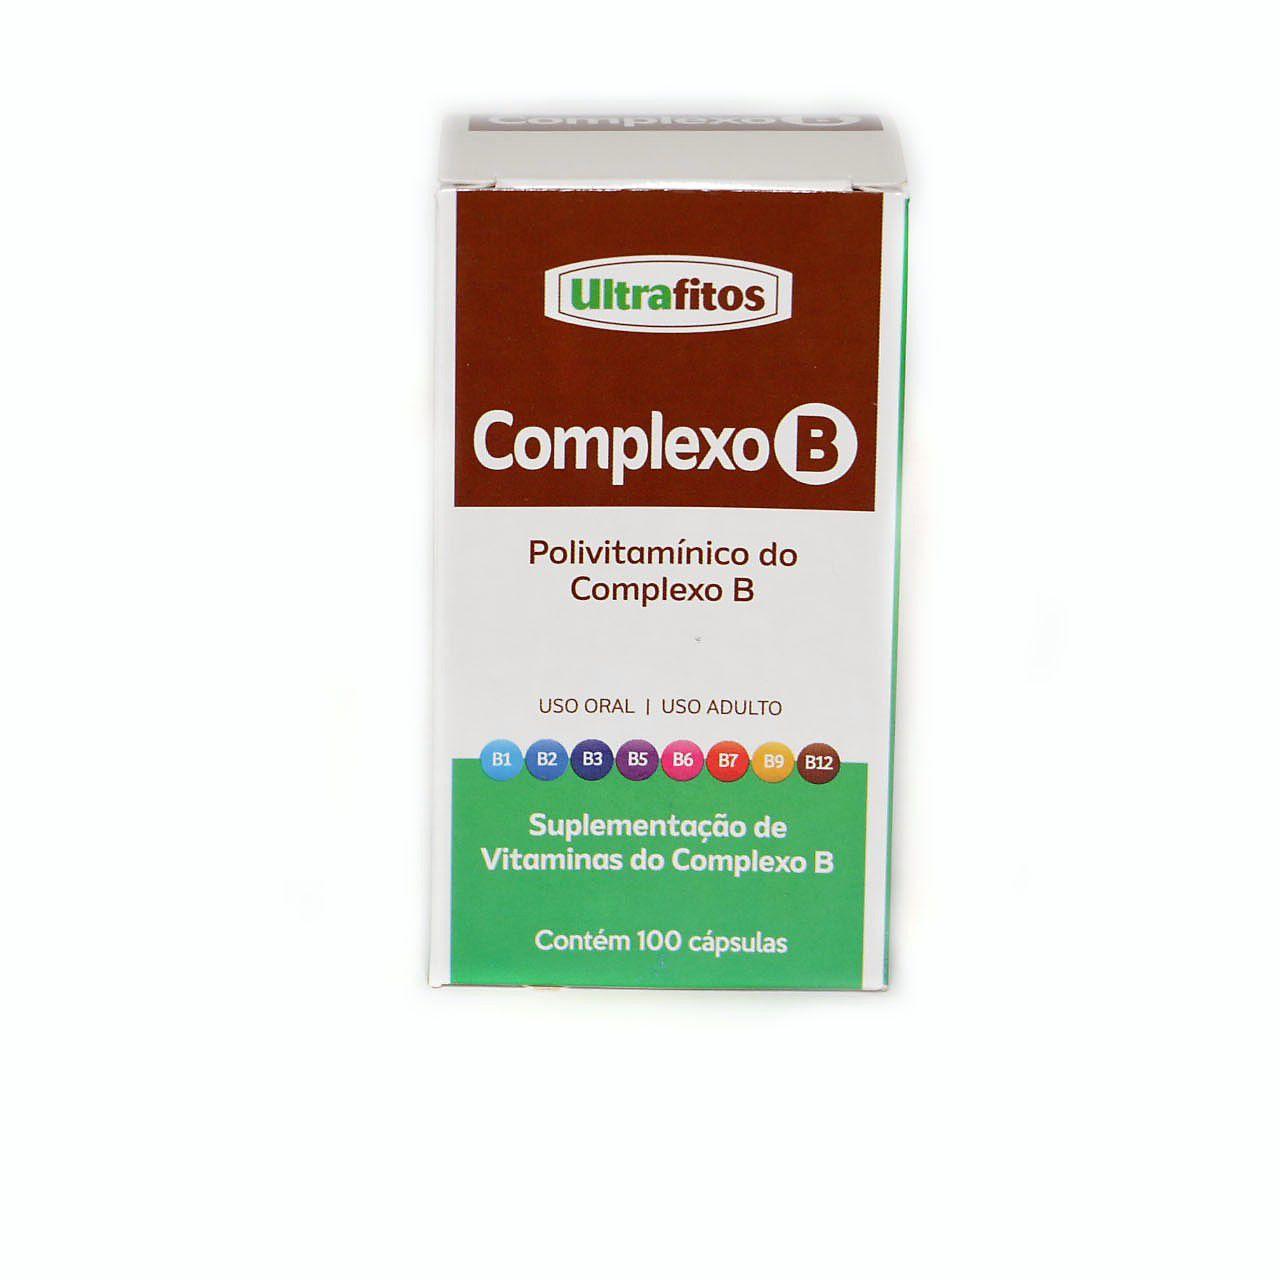 Complexo B 500mg (Concentrado C/ B12)  - 100 cápsulas - Ultrafitos